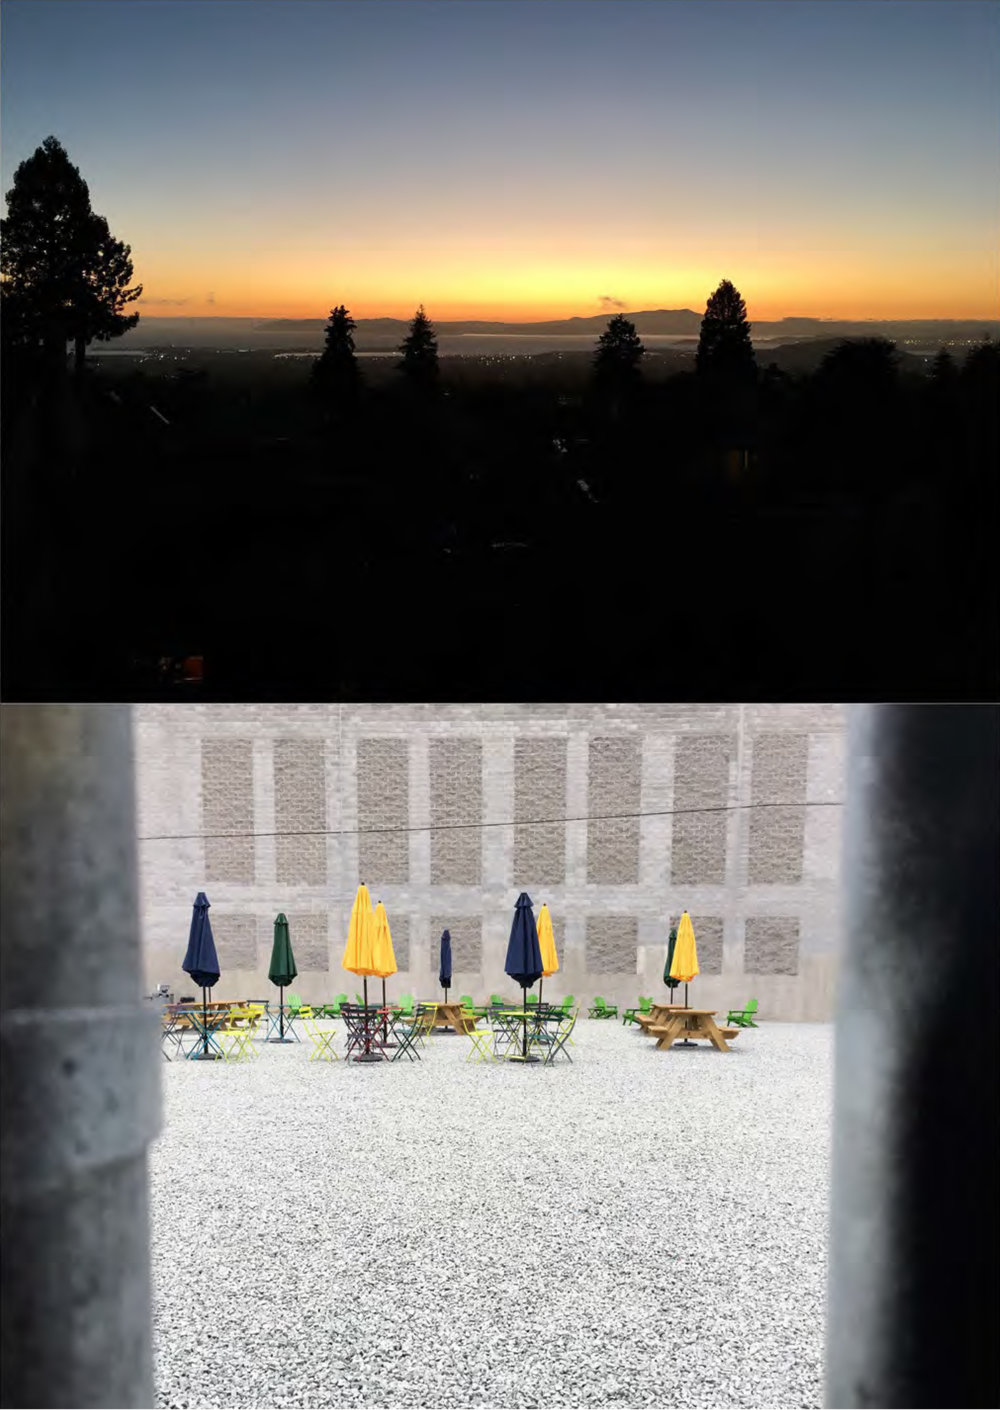 Copy of SunsetPatio (Oakland), 2018